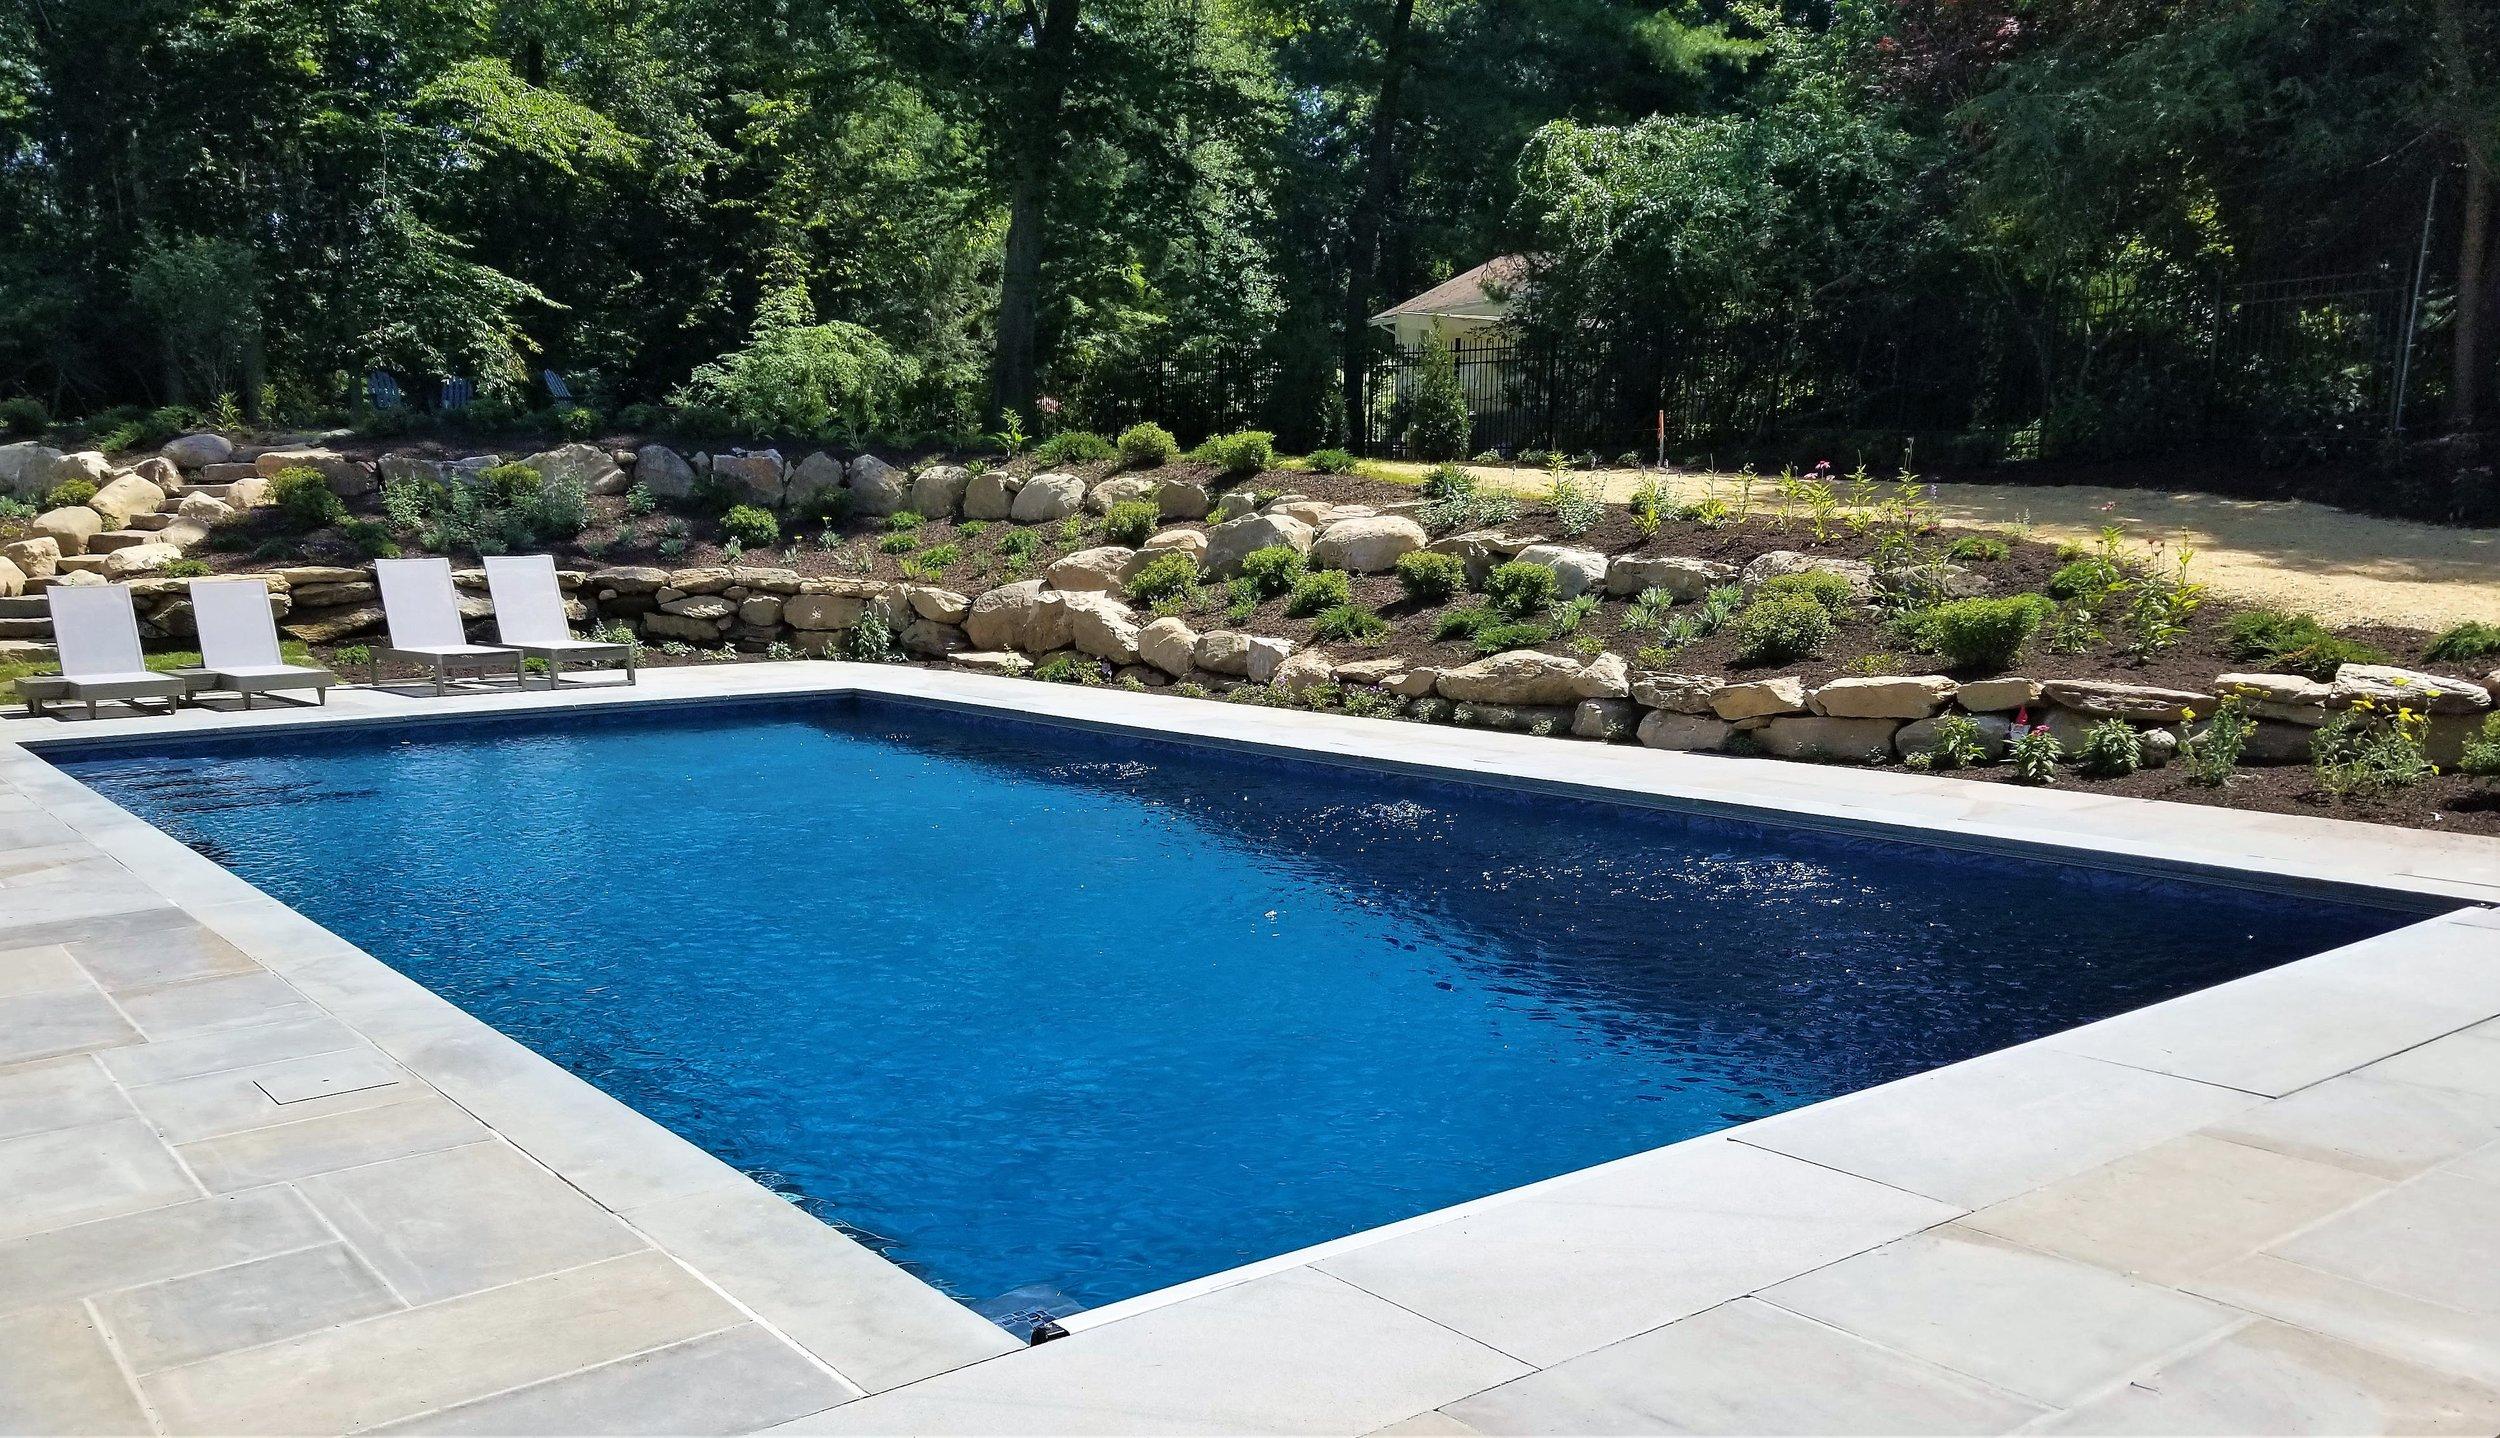 Westport gunite pool with organic boulder wall and plantings.